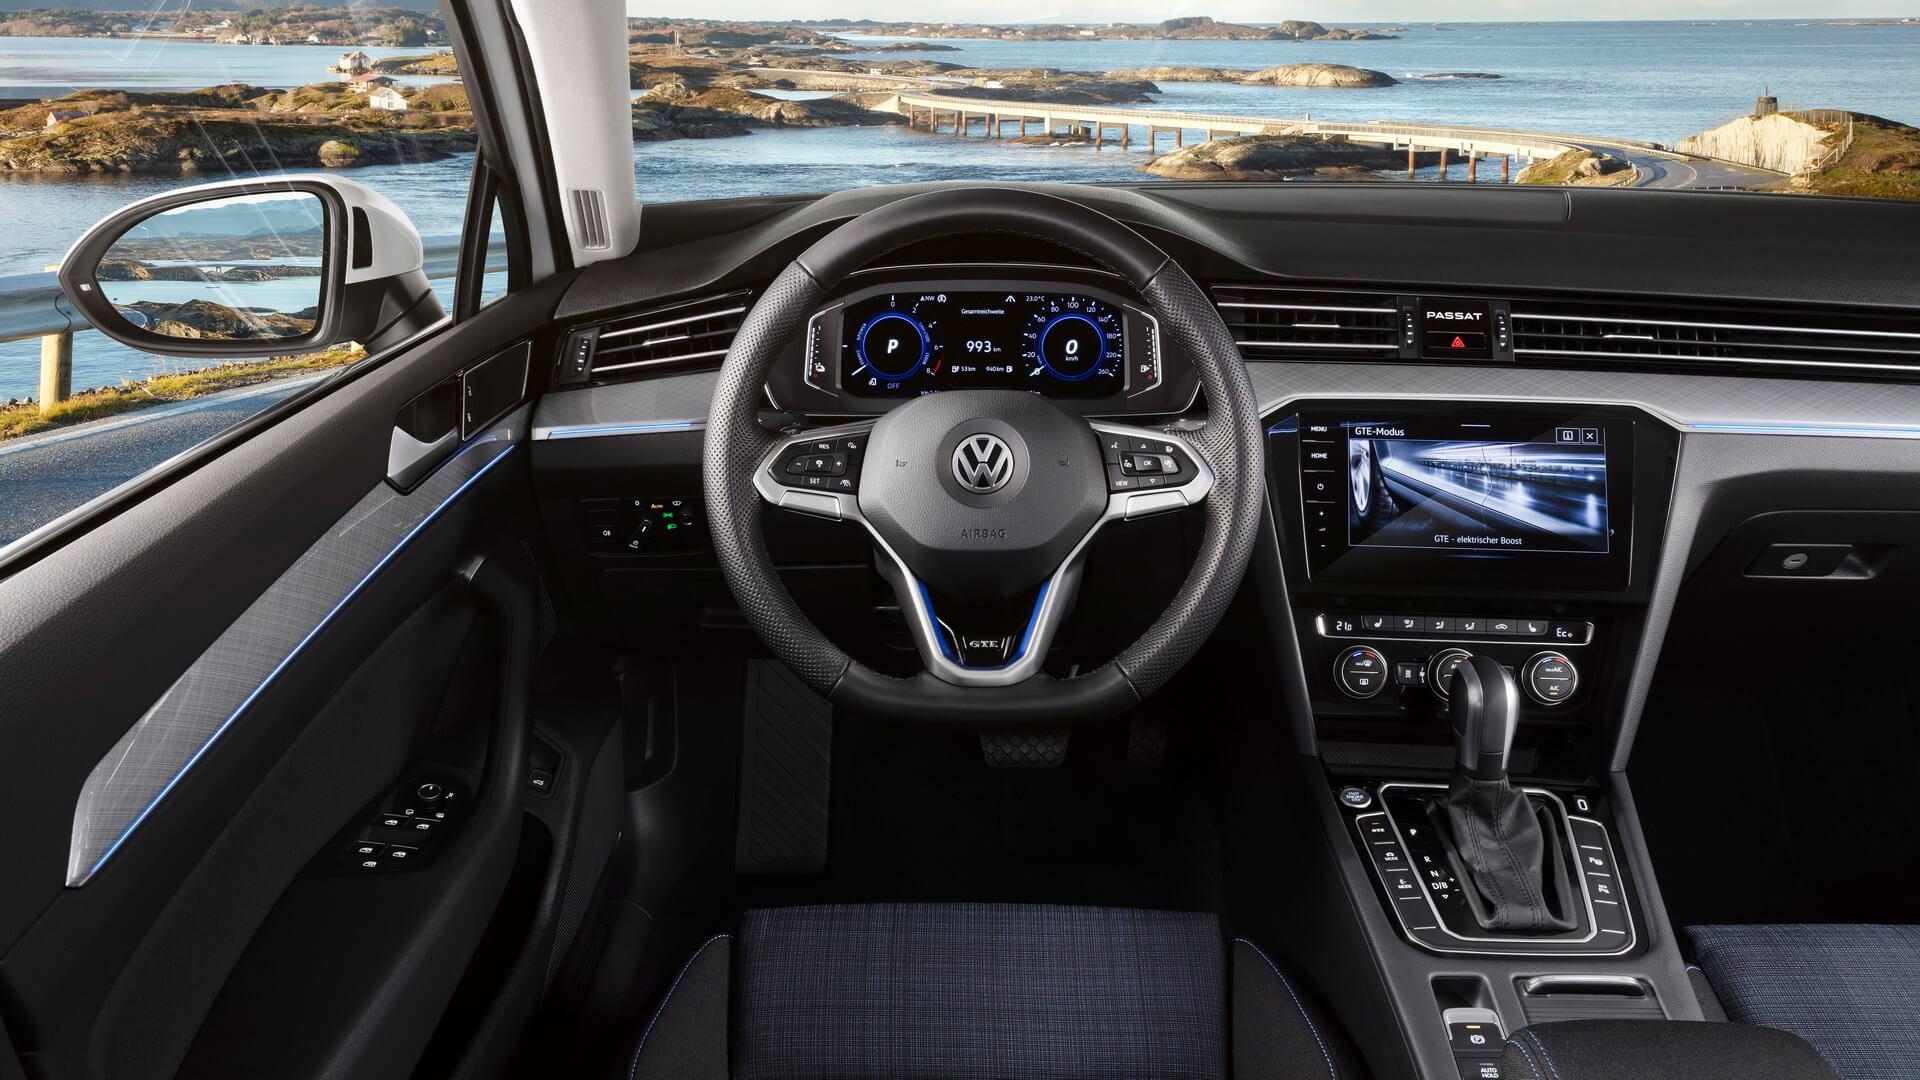 Интерьер Volkswagen Passat GTE 2019 - фото 2